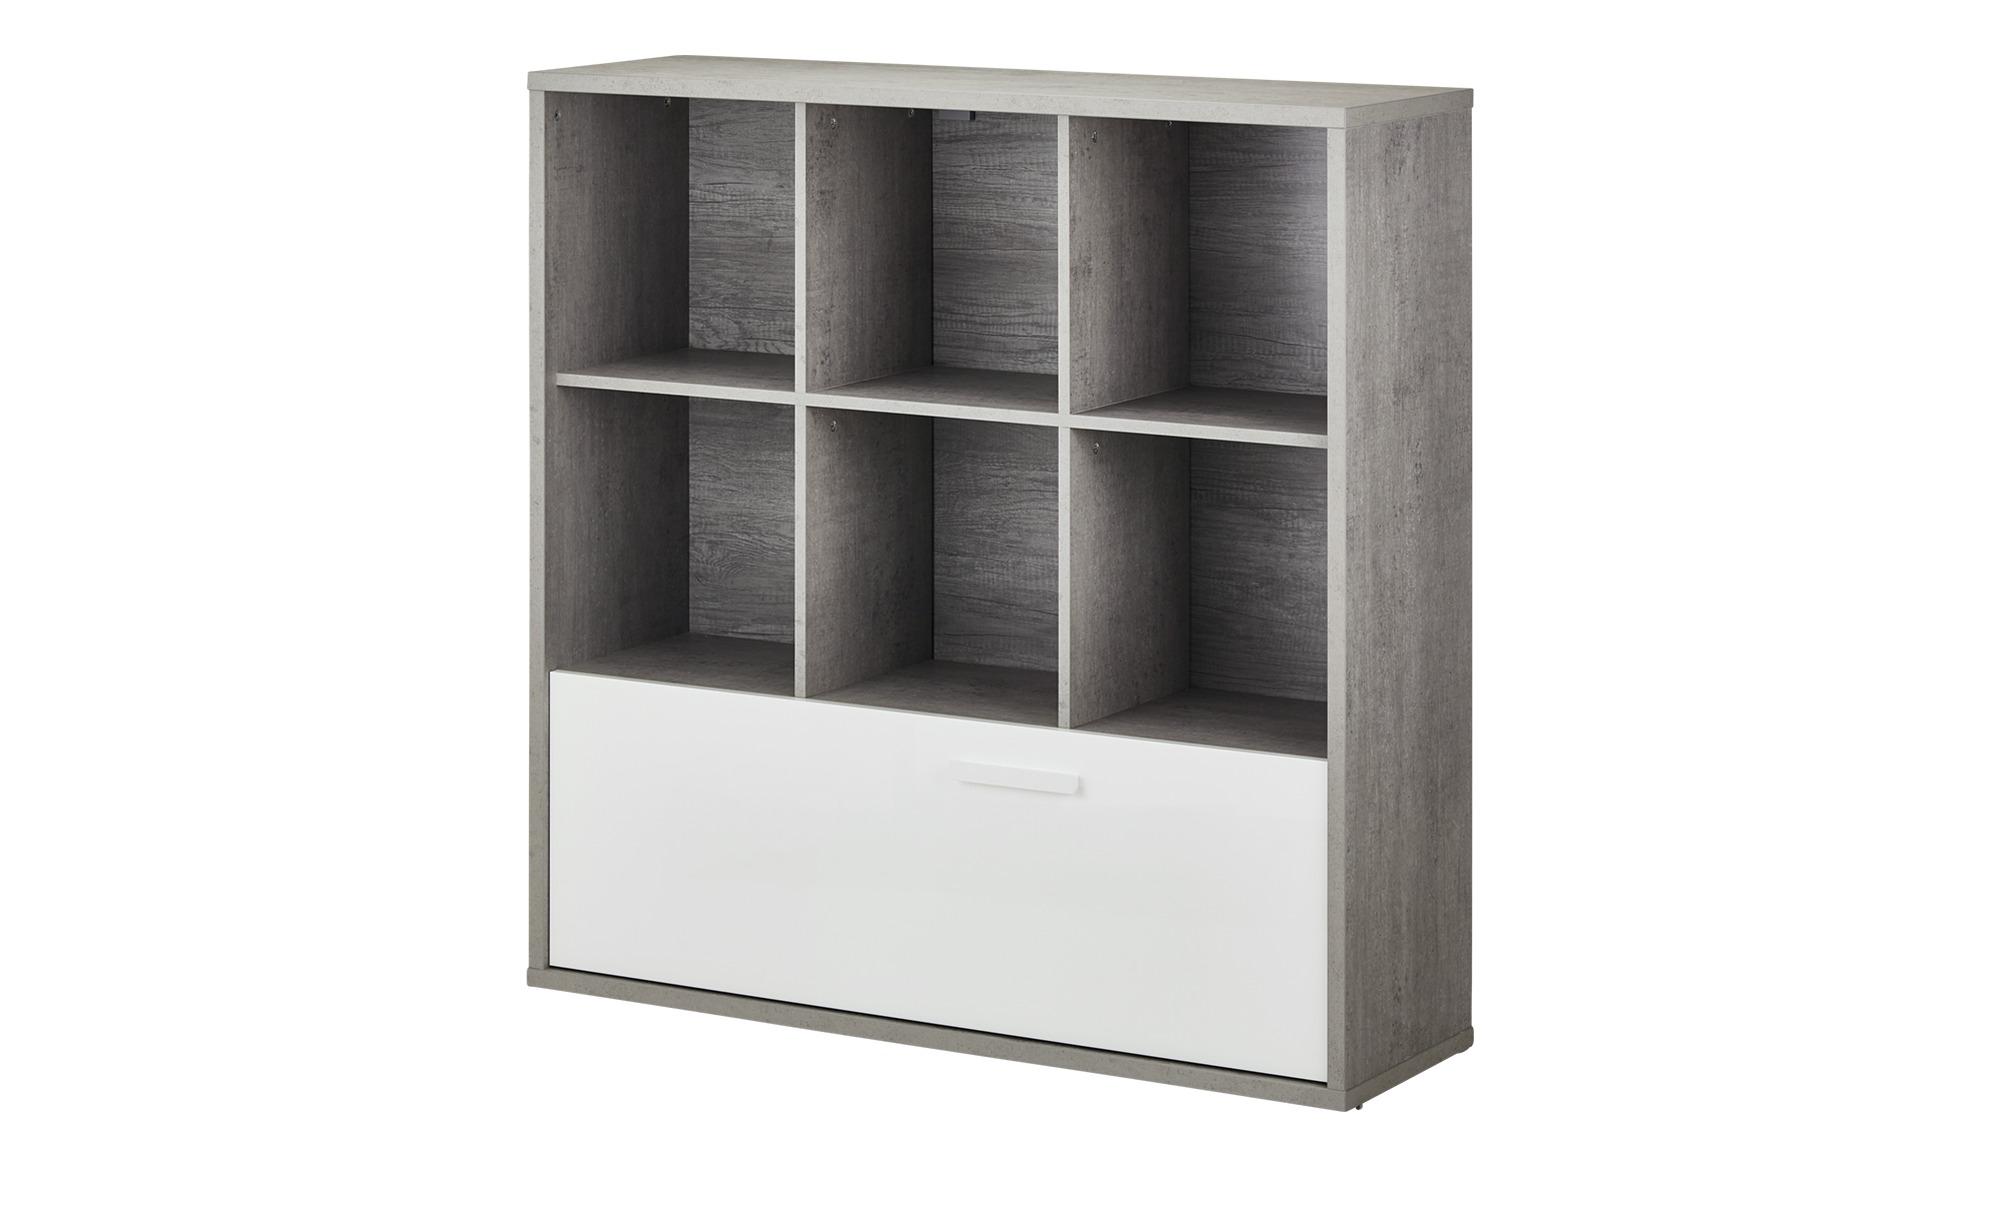 Multifunktionsregal - grau - 120 cm - 121 cm - 35,7 cm - Regale > Bücherregale - Möbel Kraft | Büro > Büroregale > Regalsysteme | Möbel Kraft